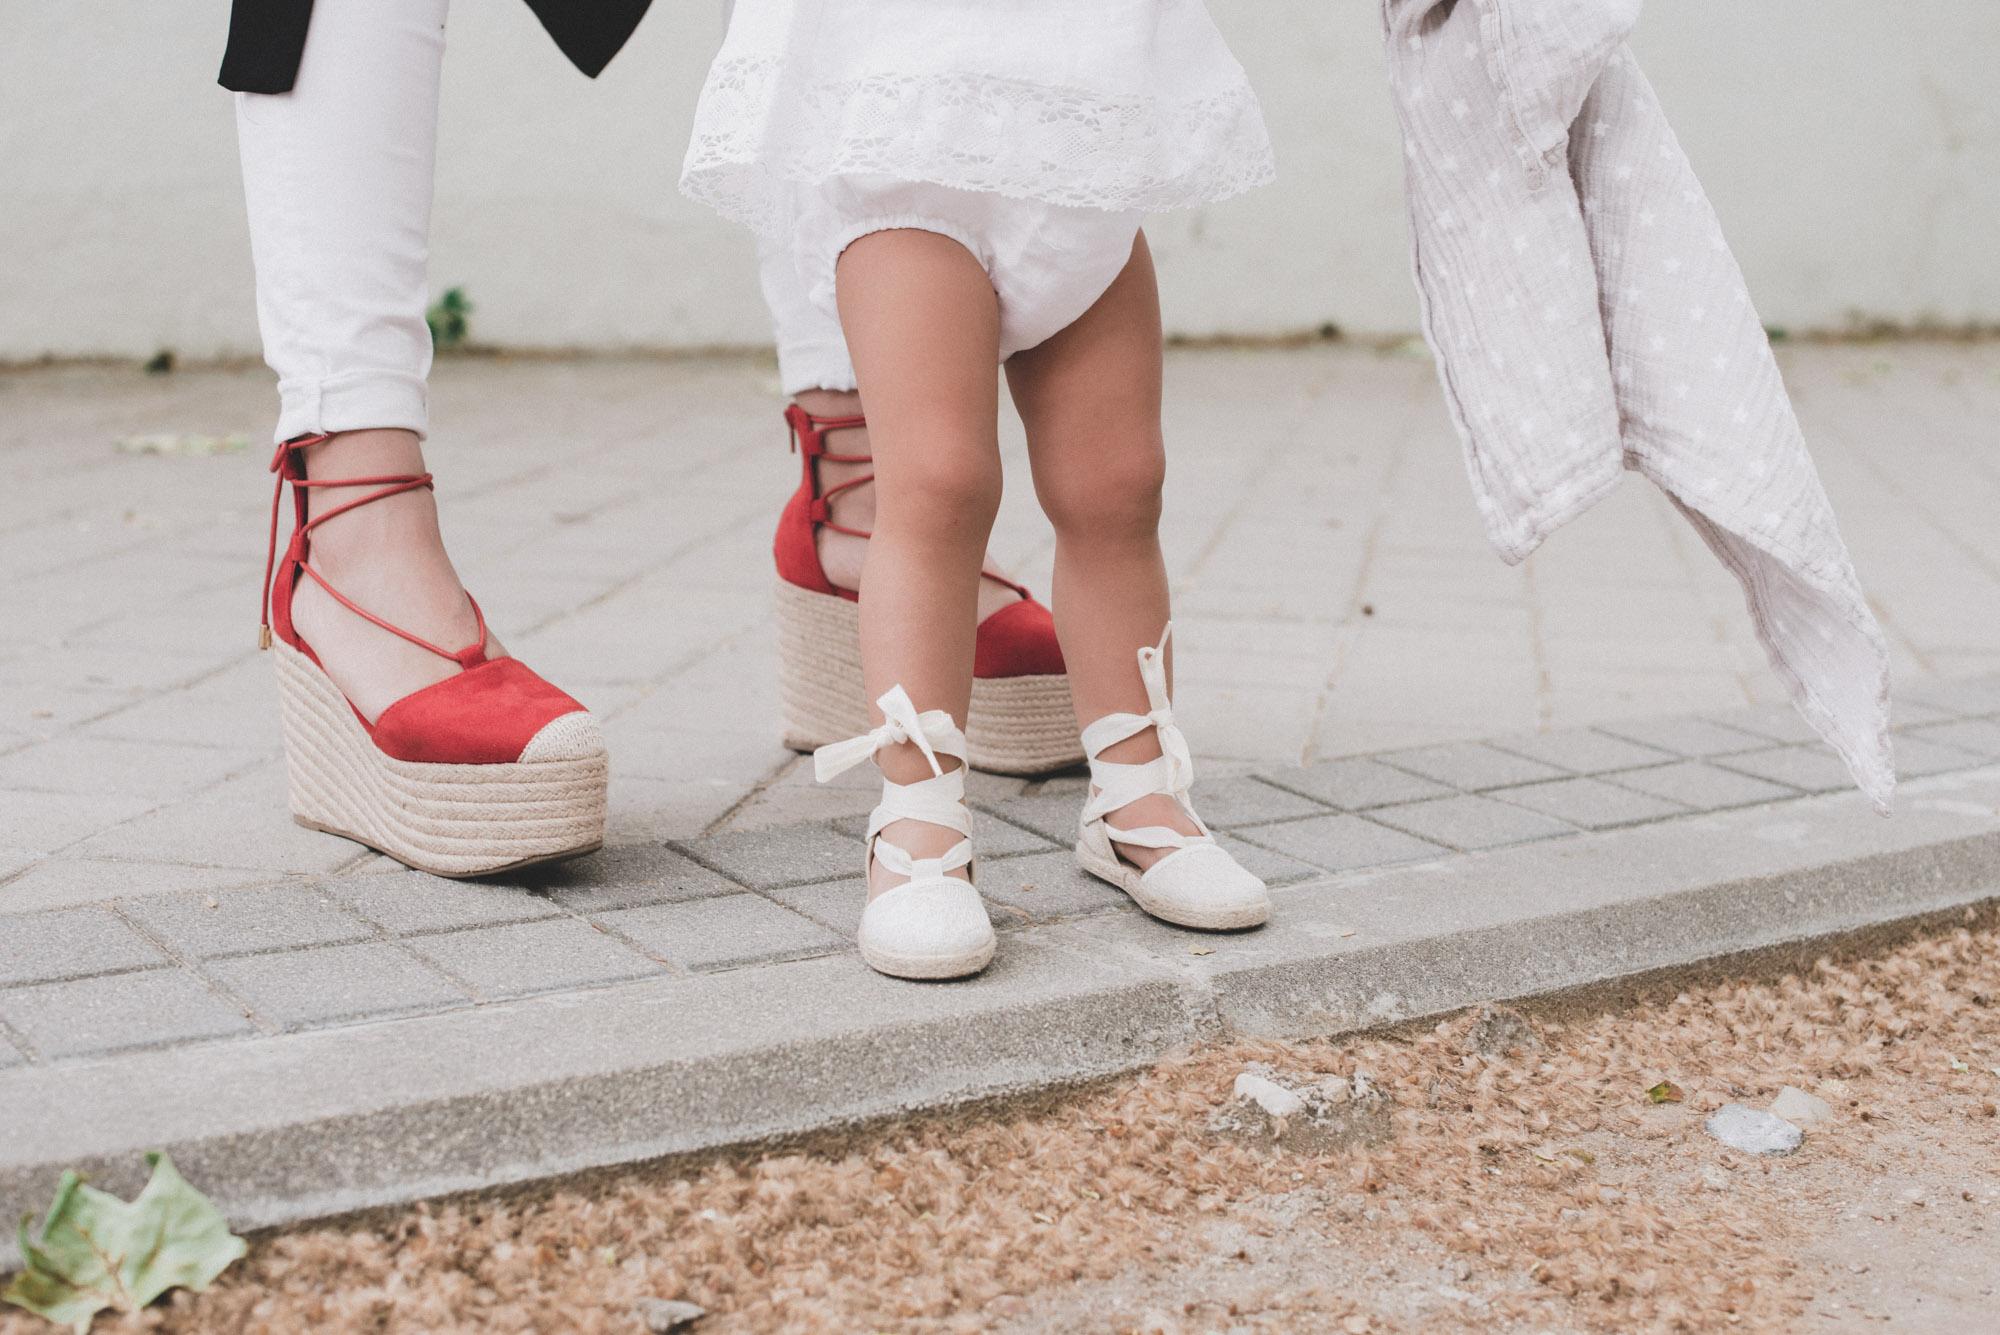 loreto-made-in-style-little-loreto-levantelier-moda-infantil-vestido-guipur-lazo-coleta-alpargatas-nina-09